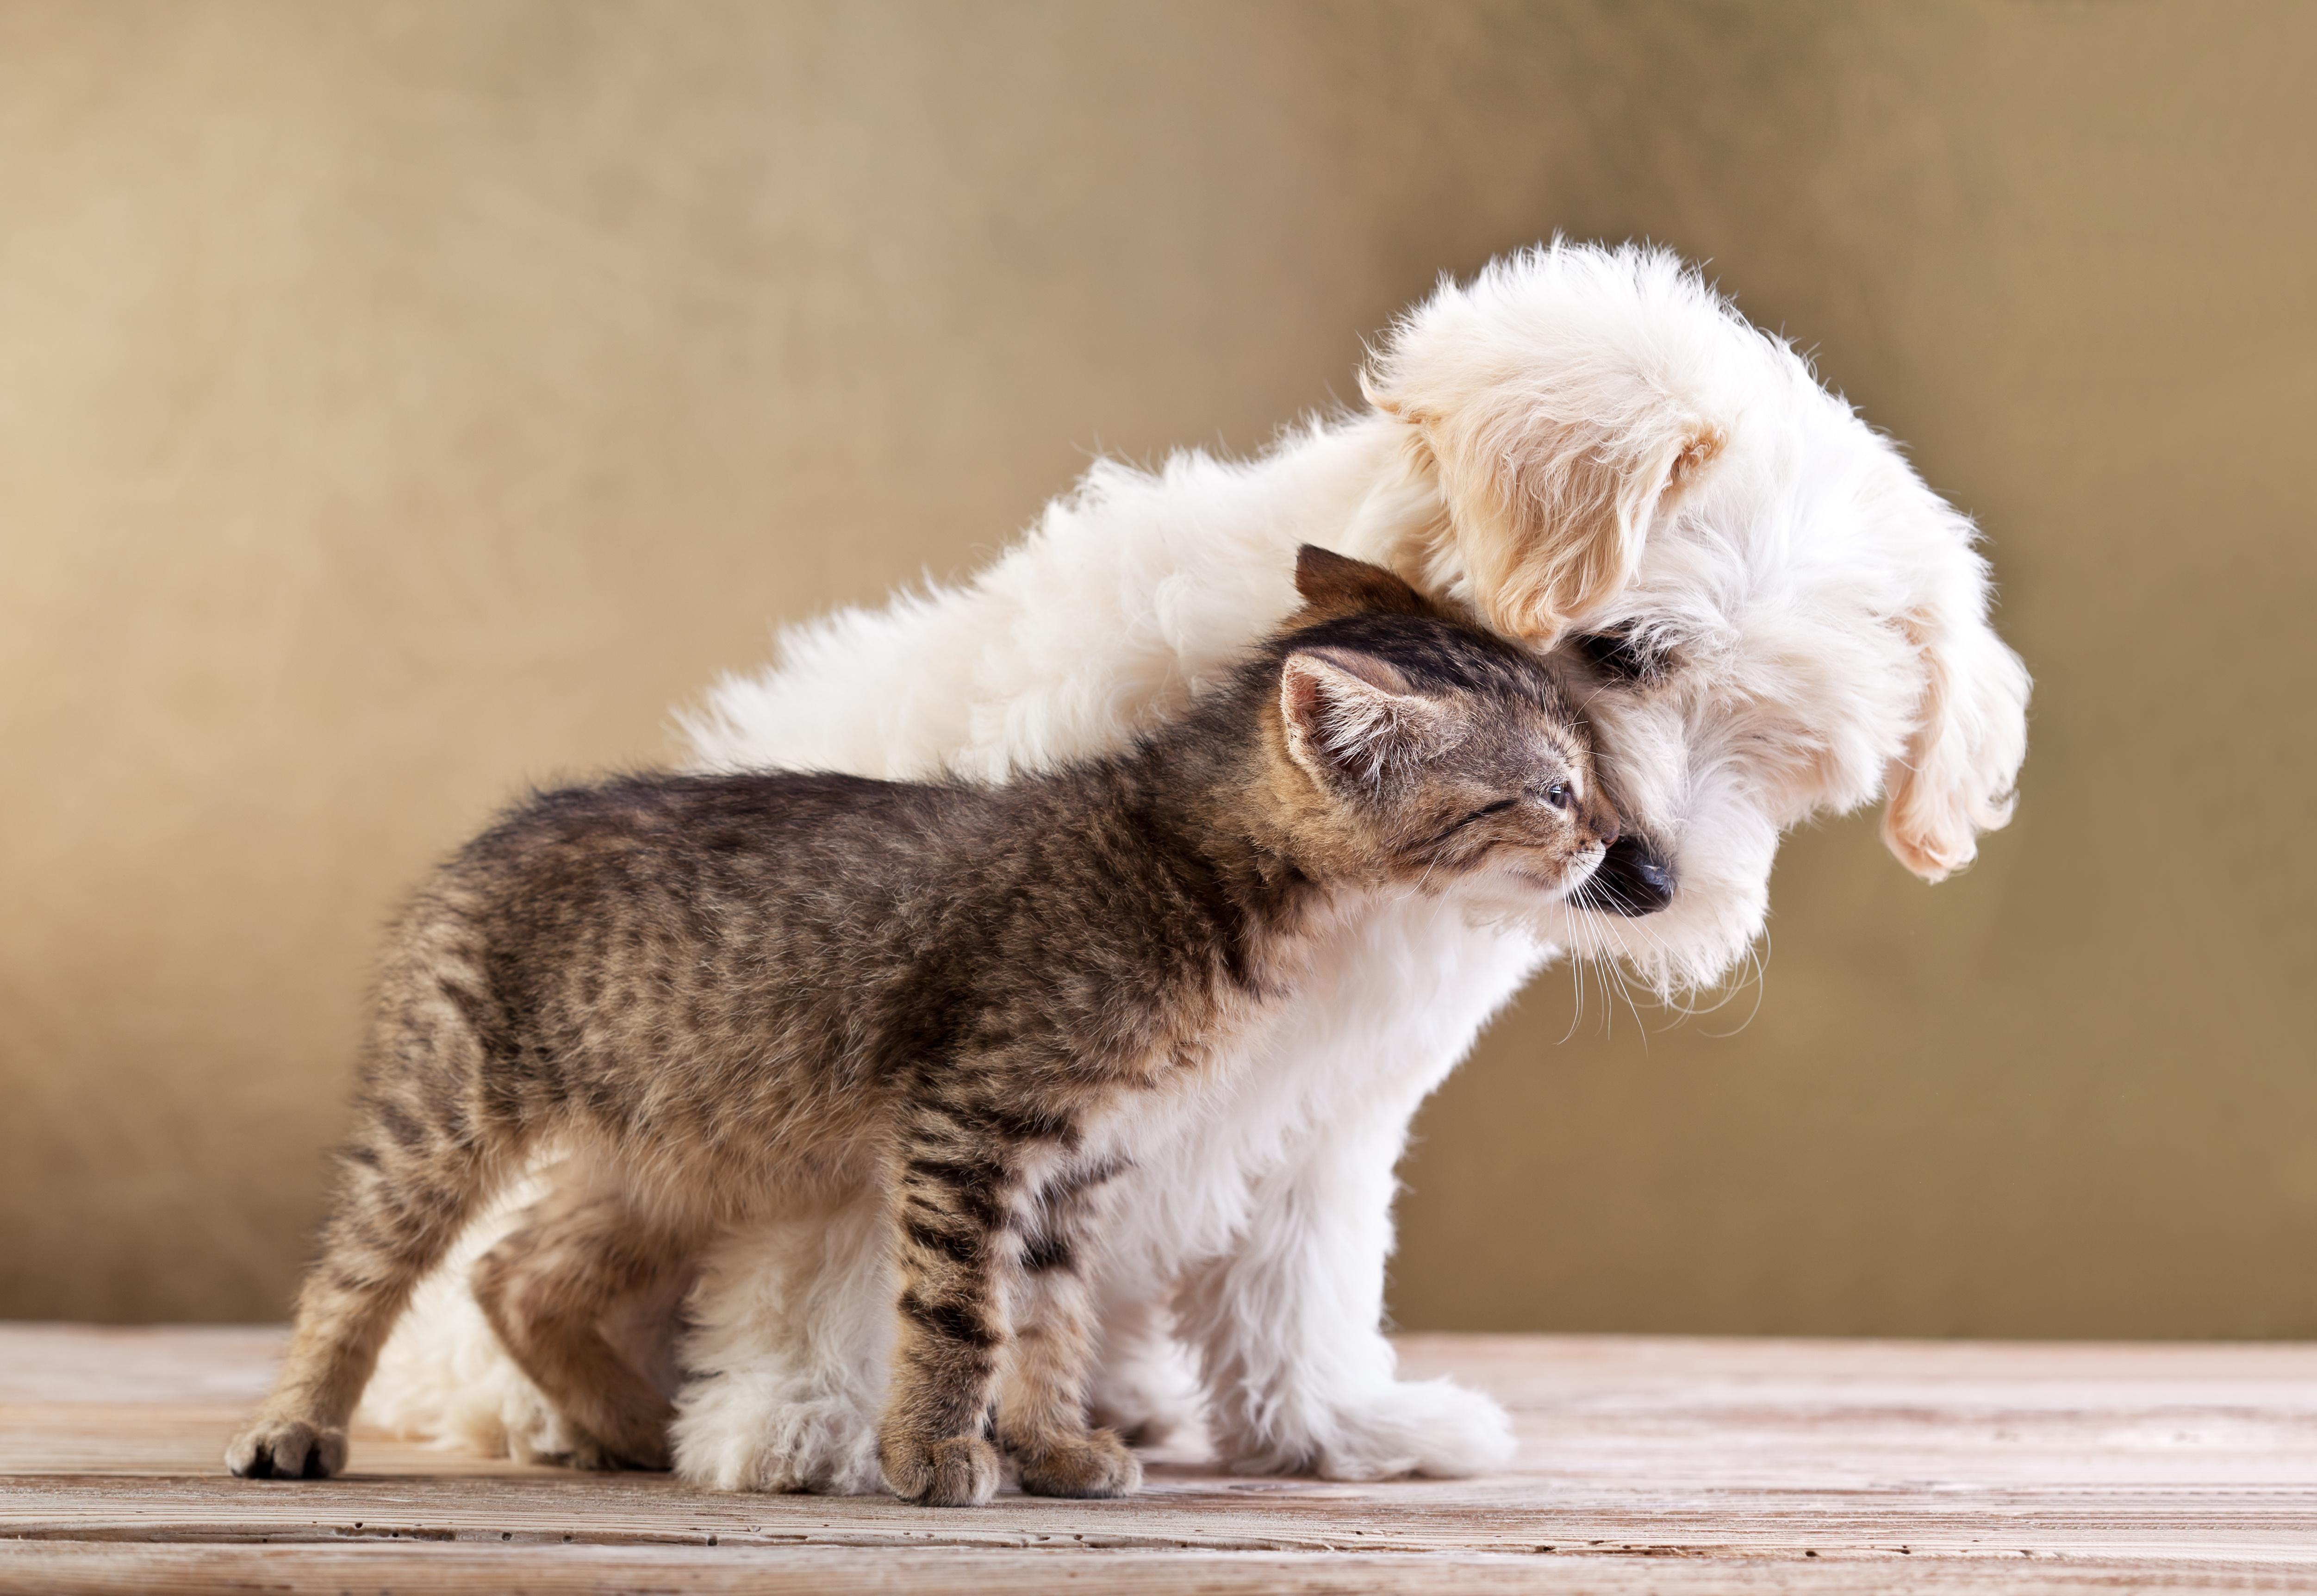 Wallpaper Animals Whiskers Friends Tenderness Puppy Kitten